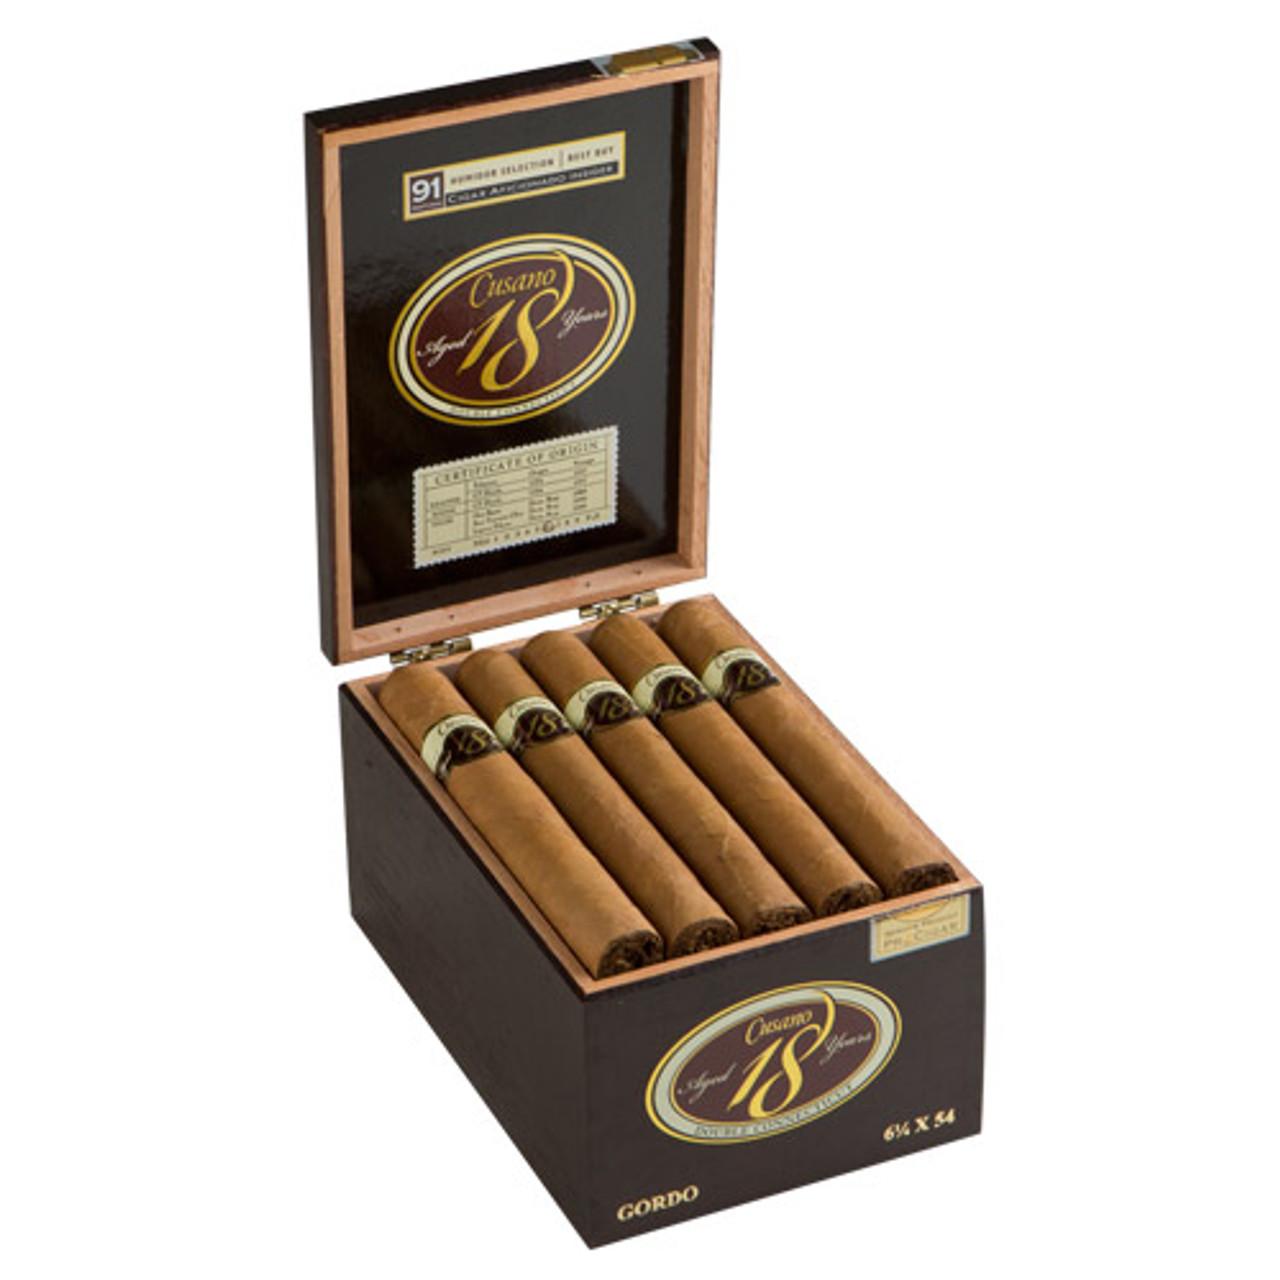 Cusano 18 Double Connecticut Toro Cigars - 6.5 x 46 (Box of 18)